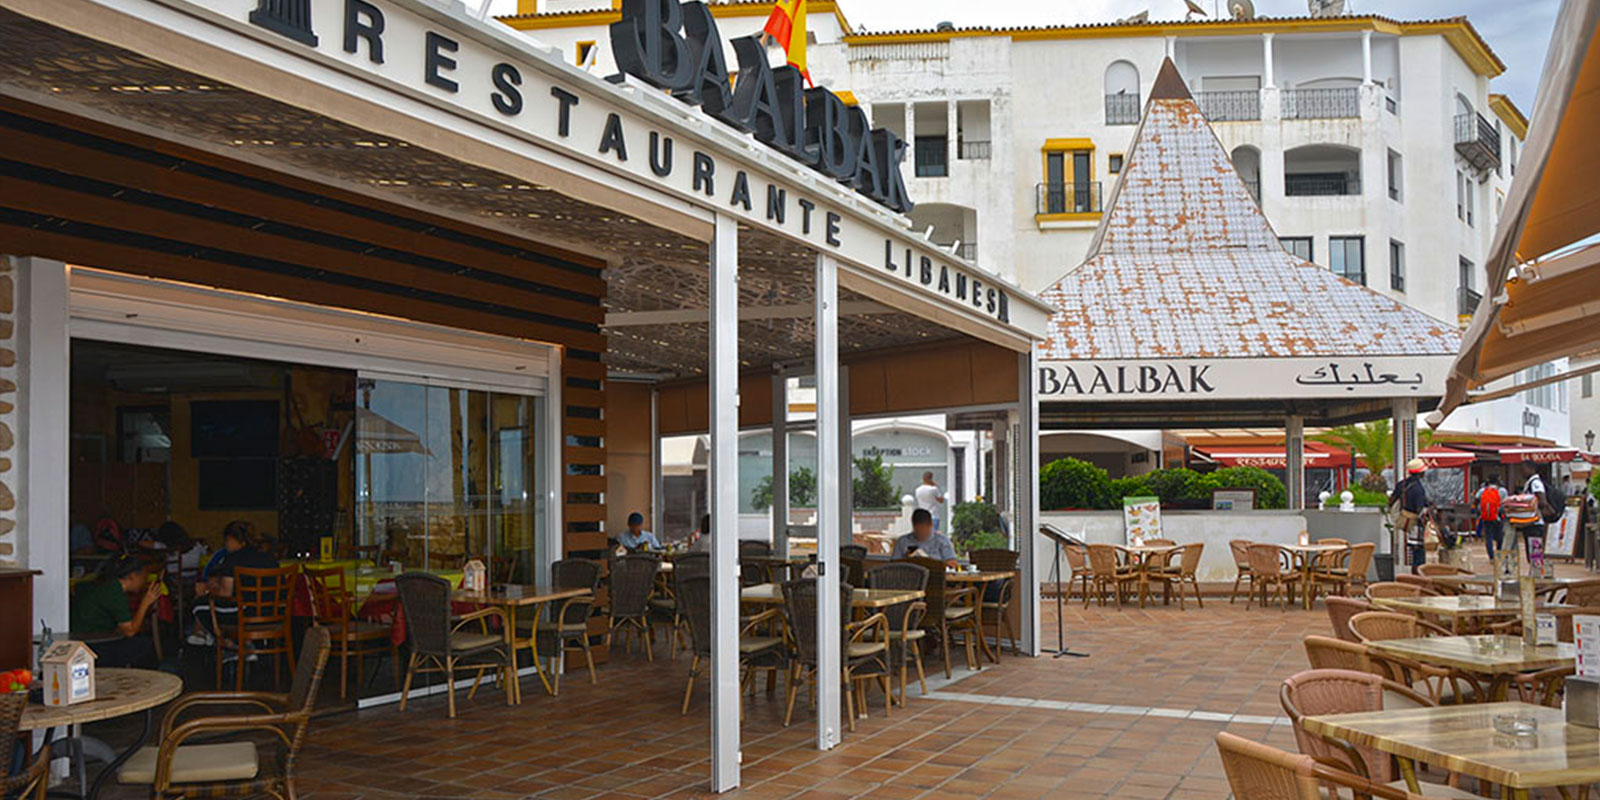 Baalbak marbella lebanese restaurant marbella lebanese - Restaurante noto marbella ...